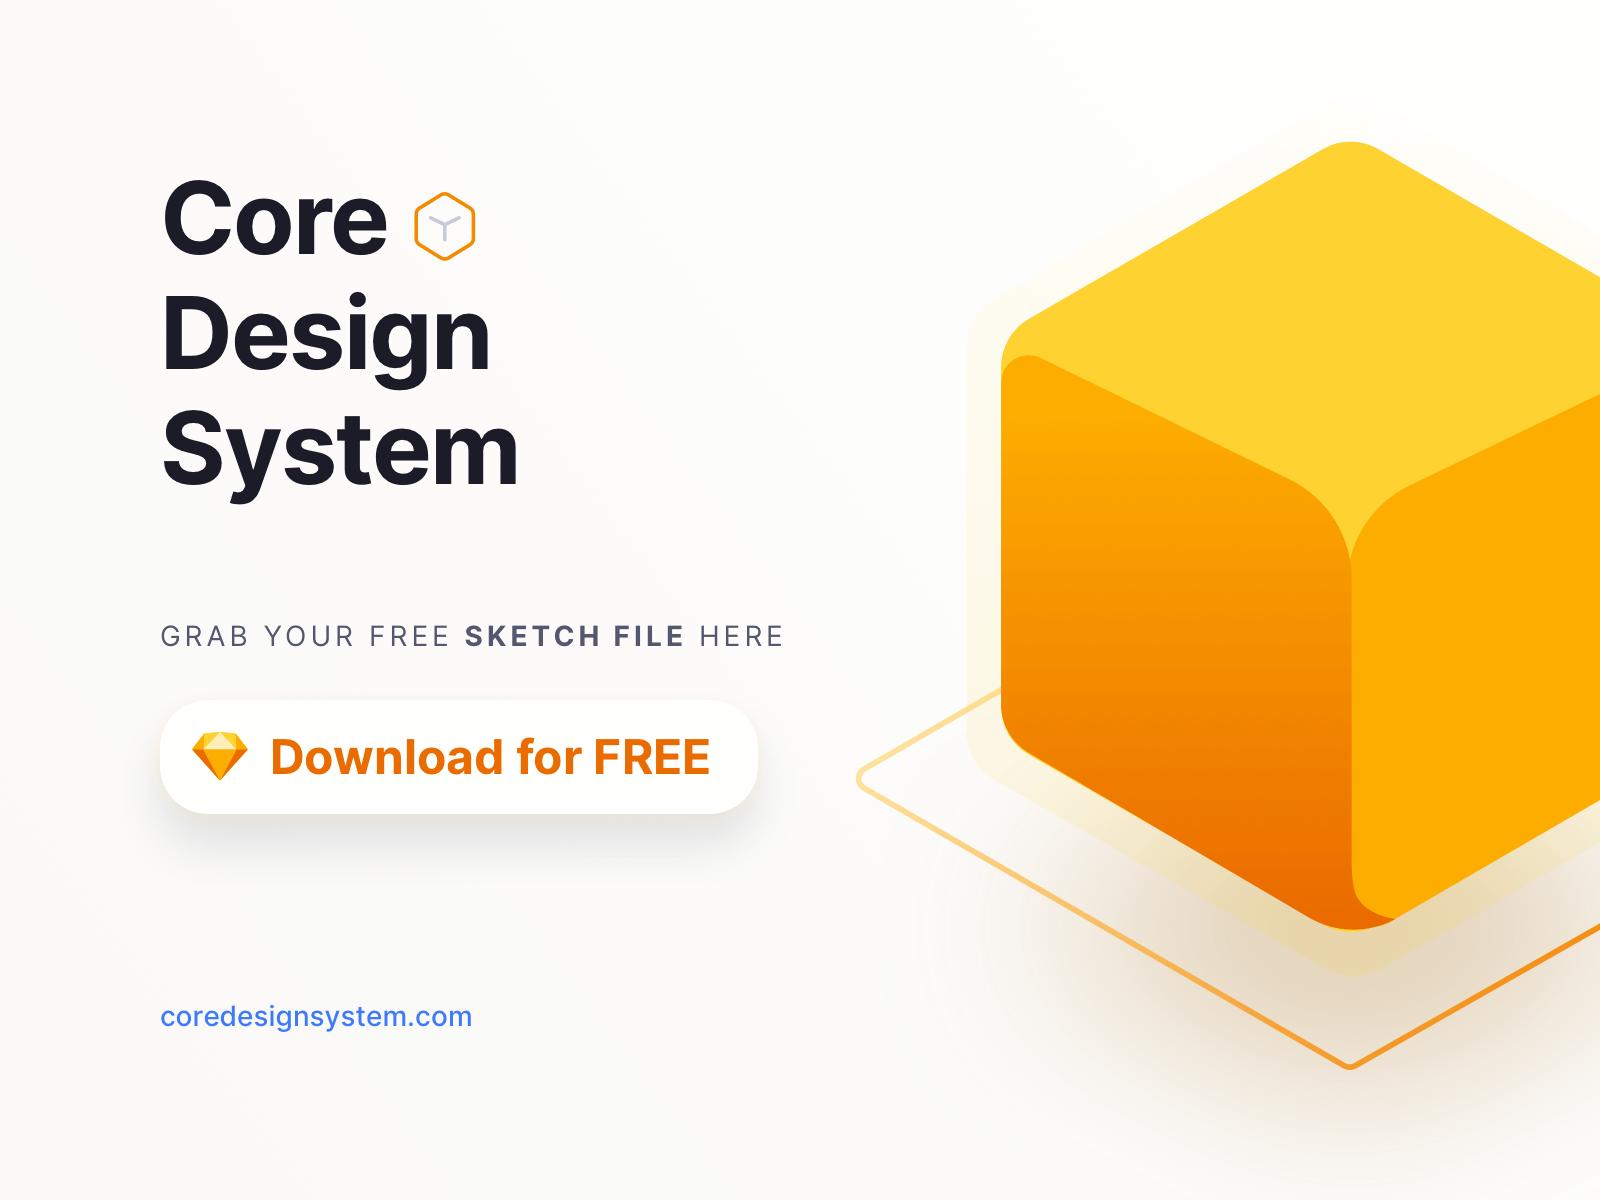 Core Design System - Sketch Free File presentation image